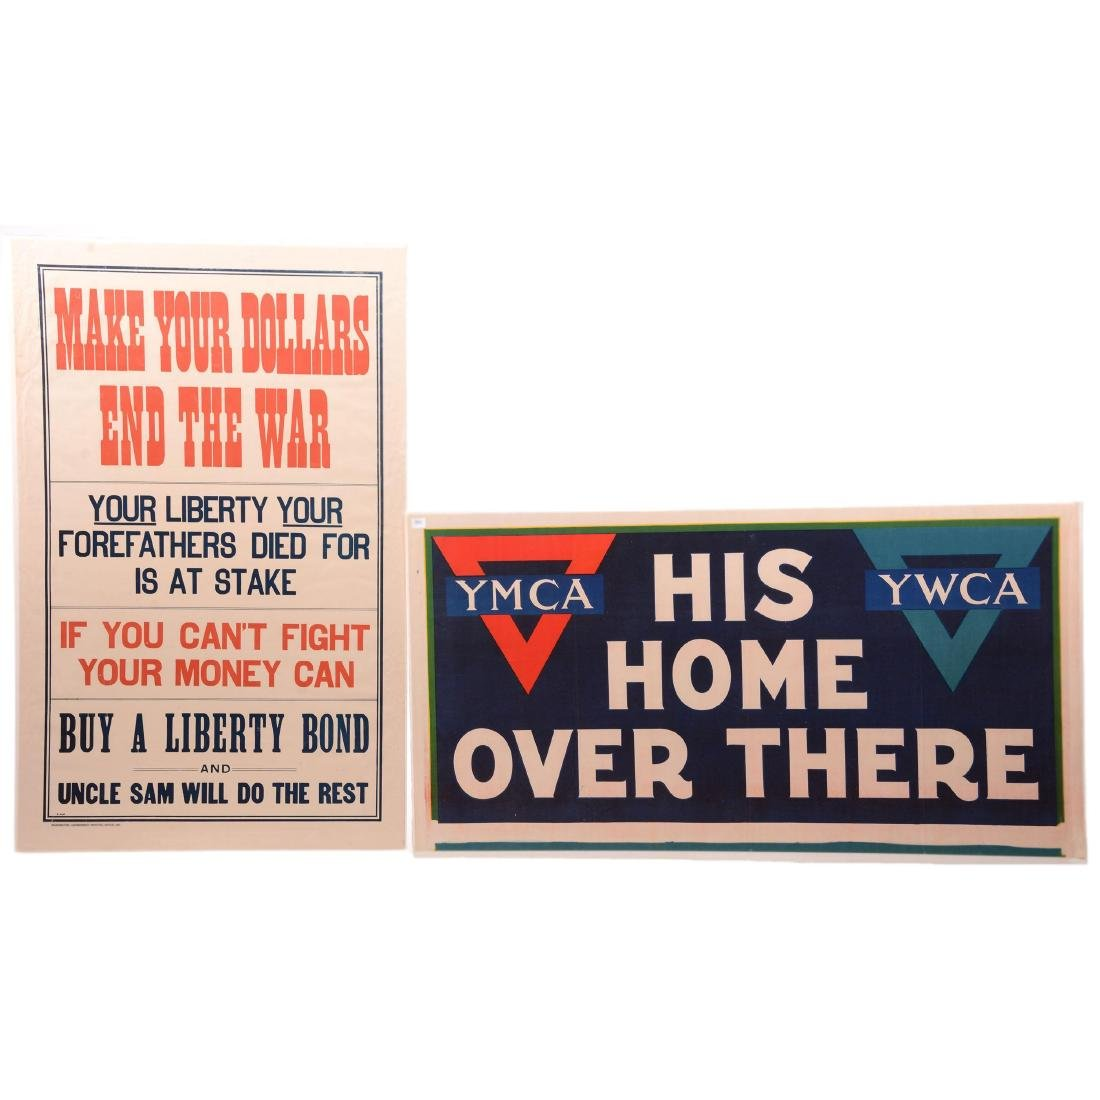 Two Vintage World War I Propaganda Posters